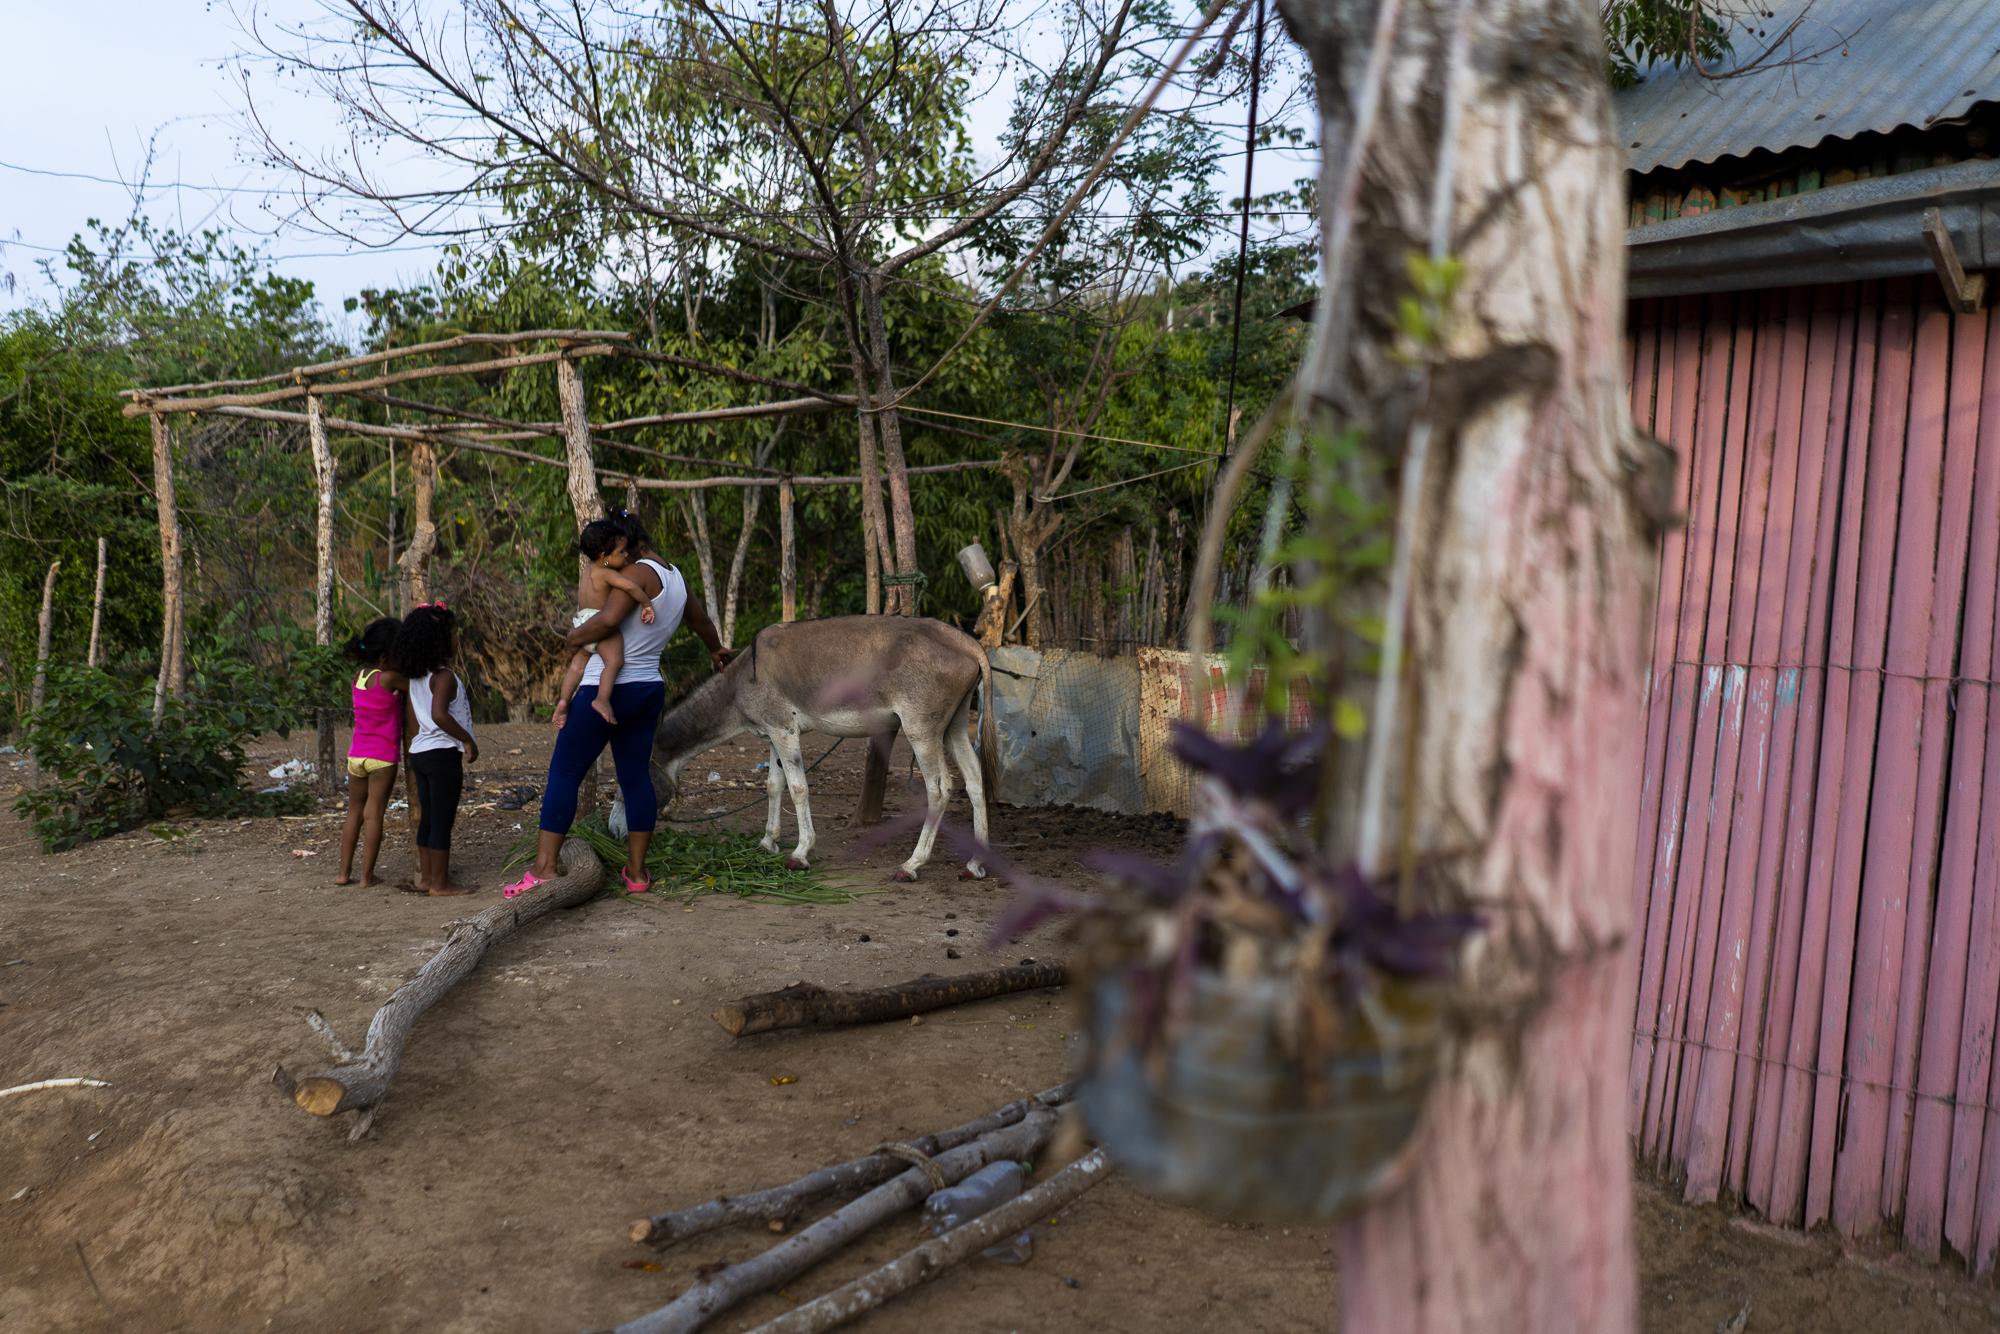 burro project-14.jpg